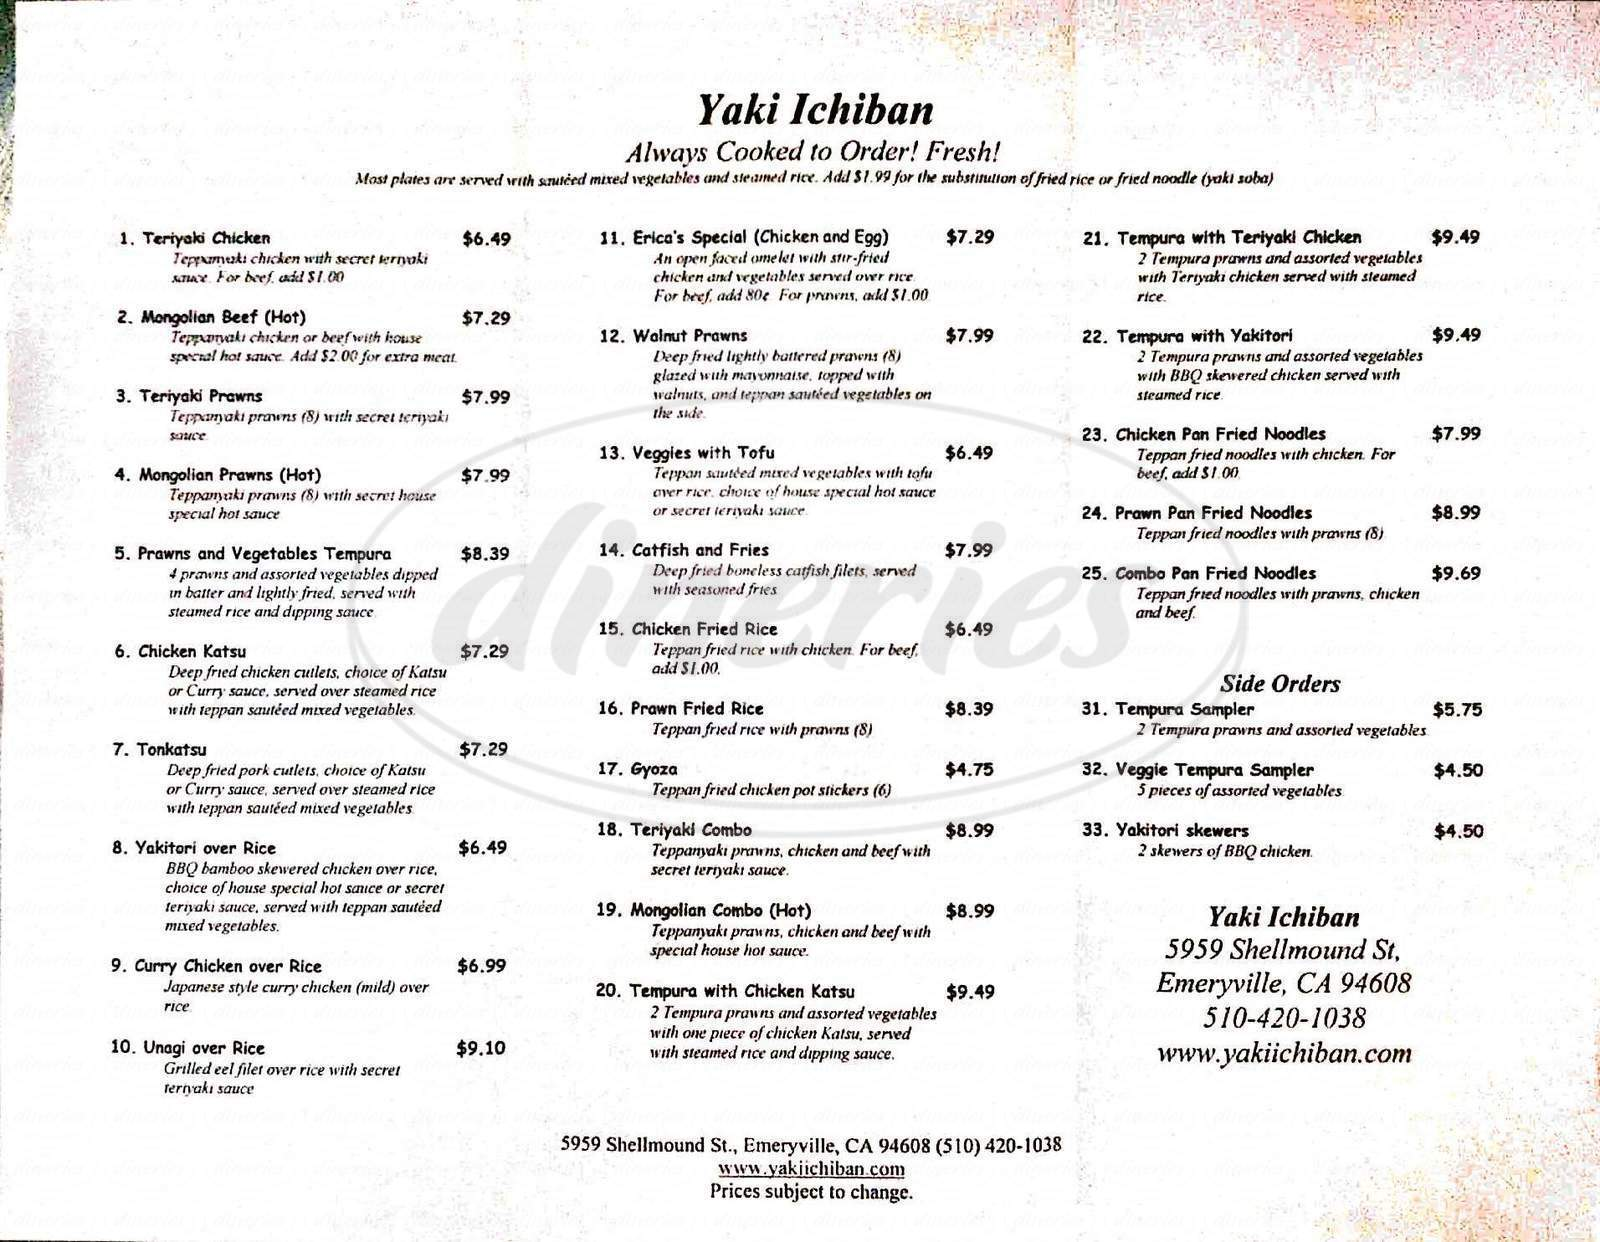 menu for Yaki Ichiban